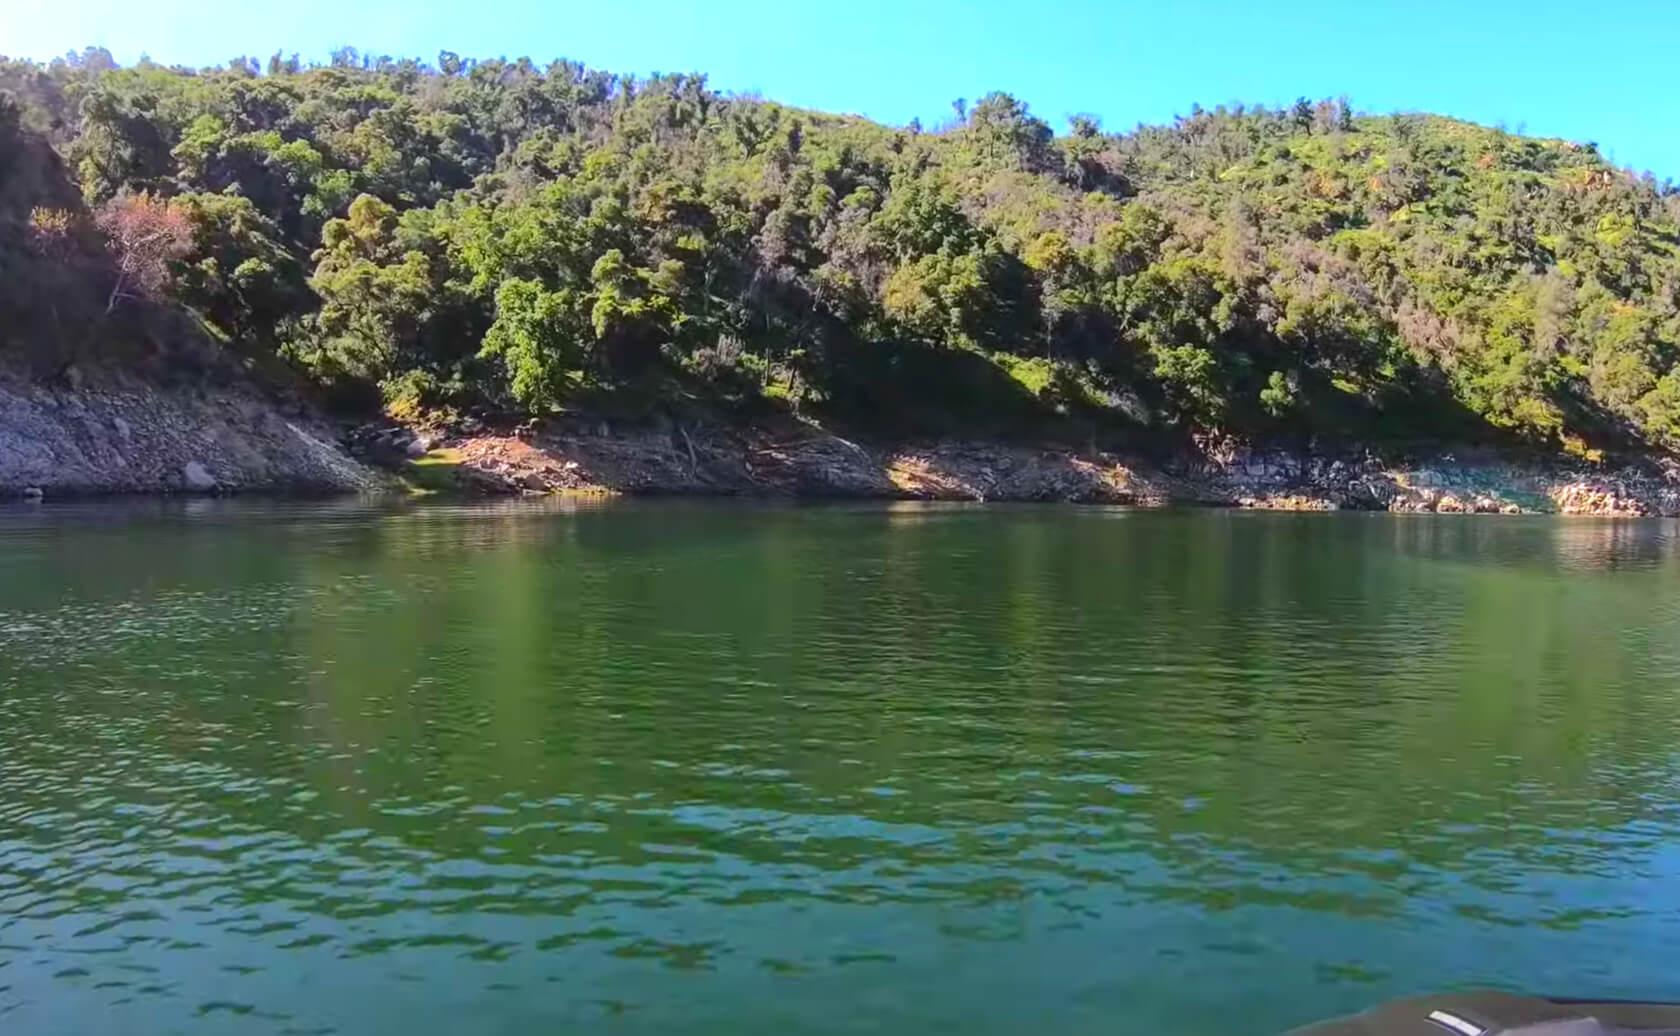 Nacimiento-Lake-Fishing-Guide-Report-California-02